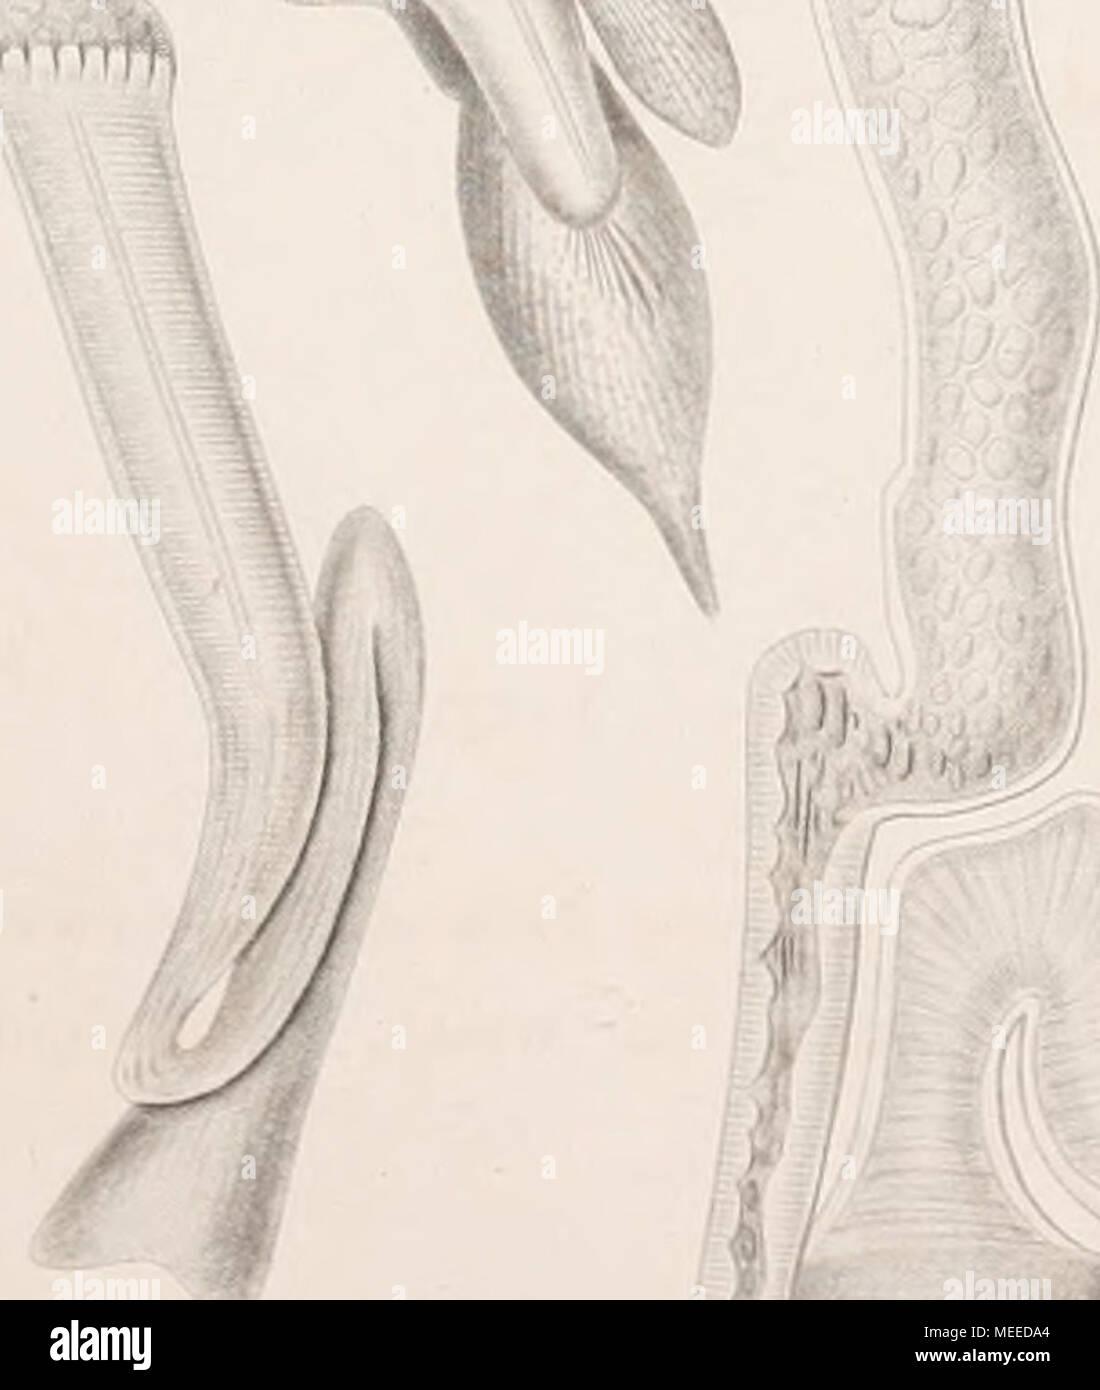 Booksubjectworms Stockfotos & Booksubjectworms Bilder - Alamy